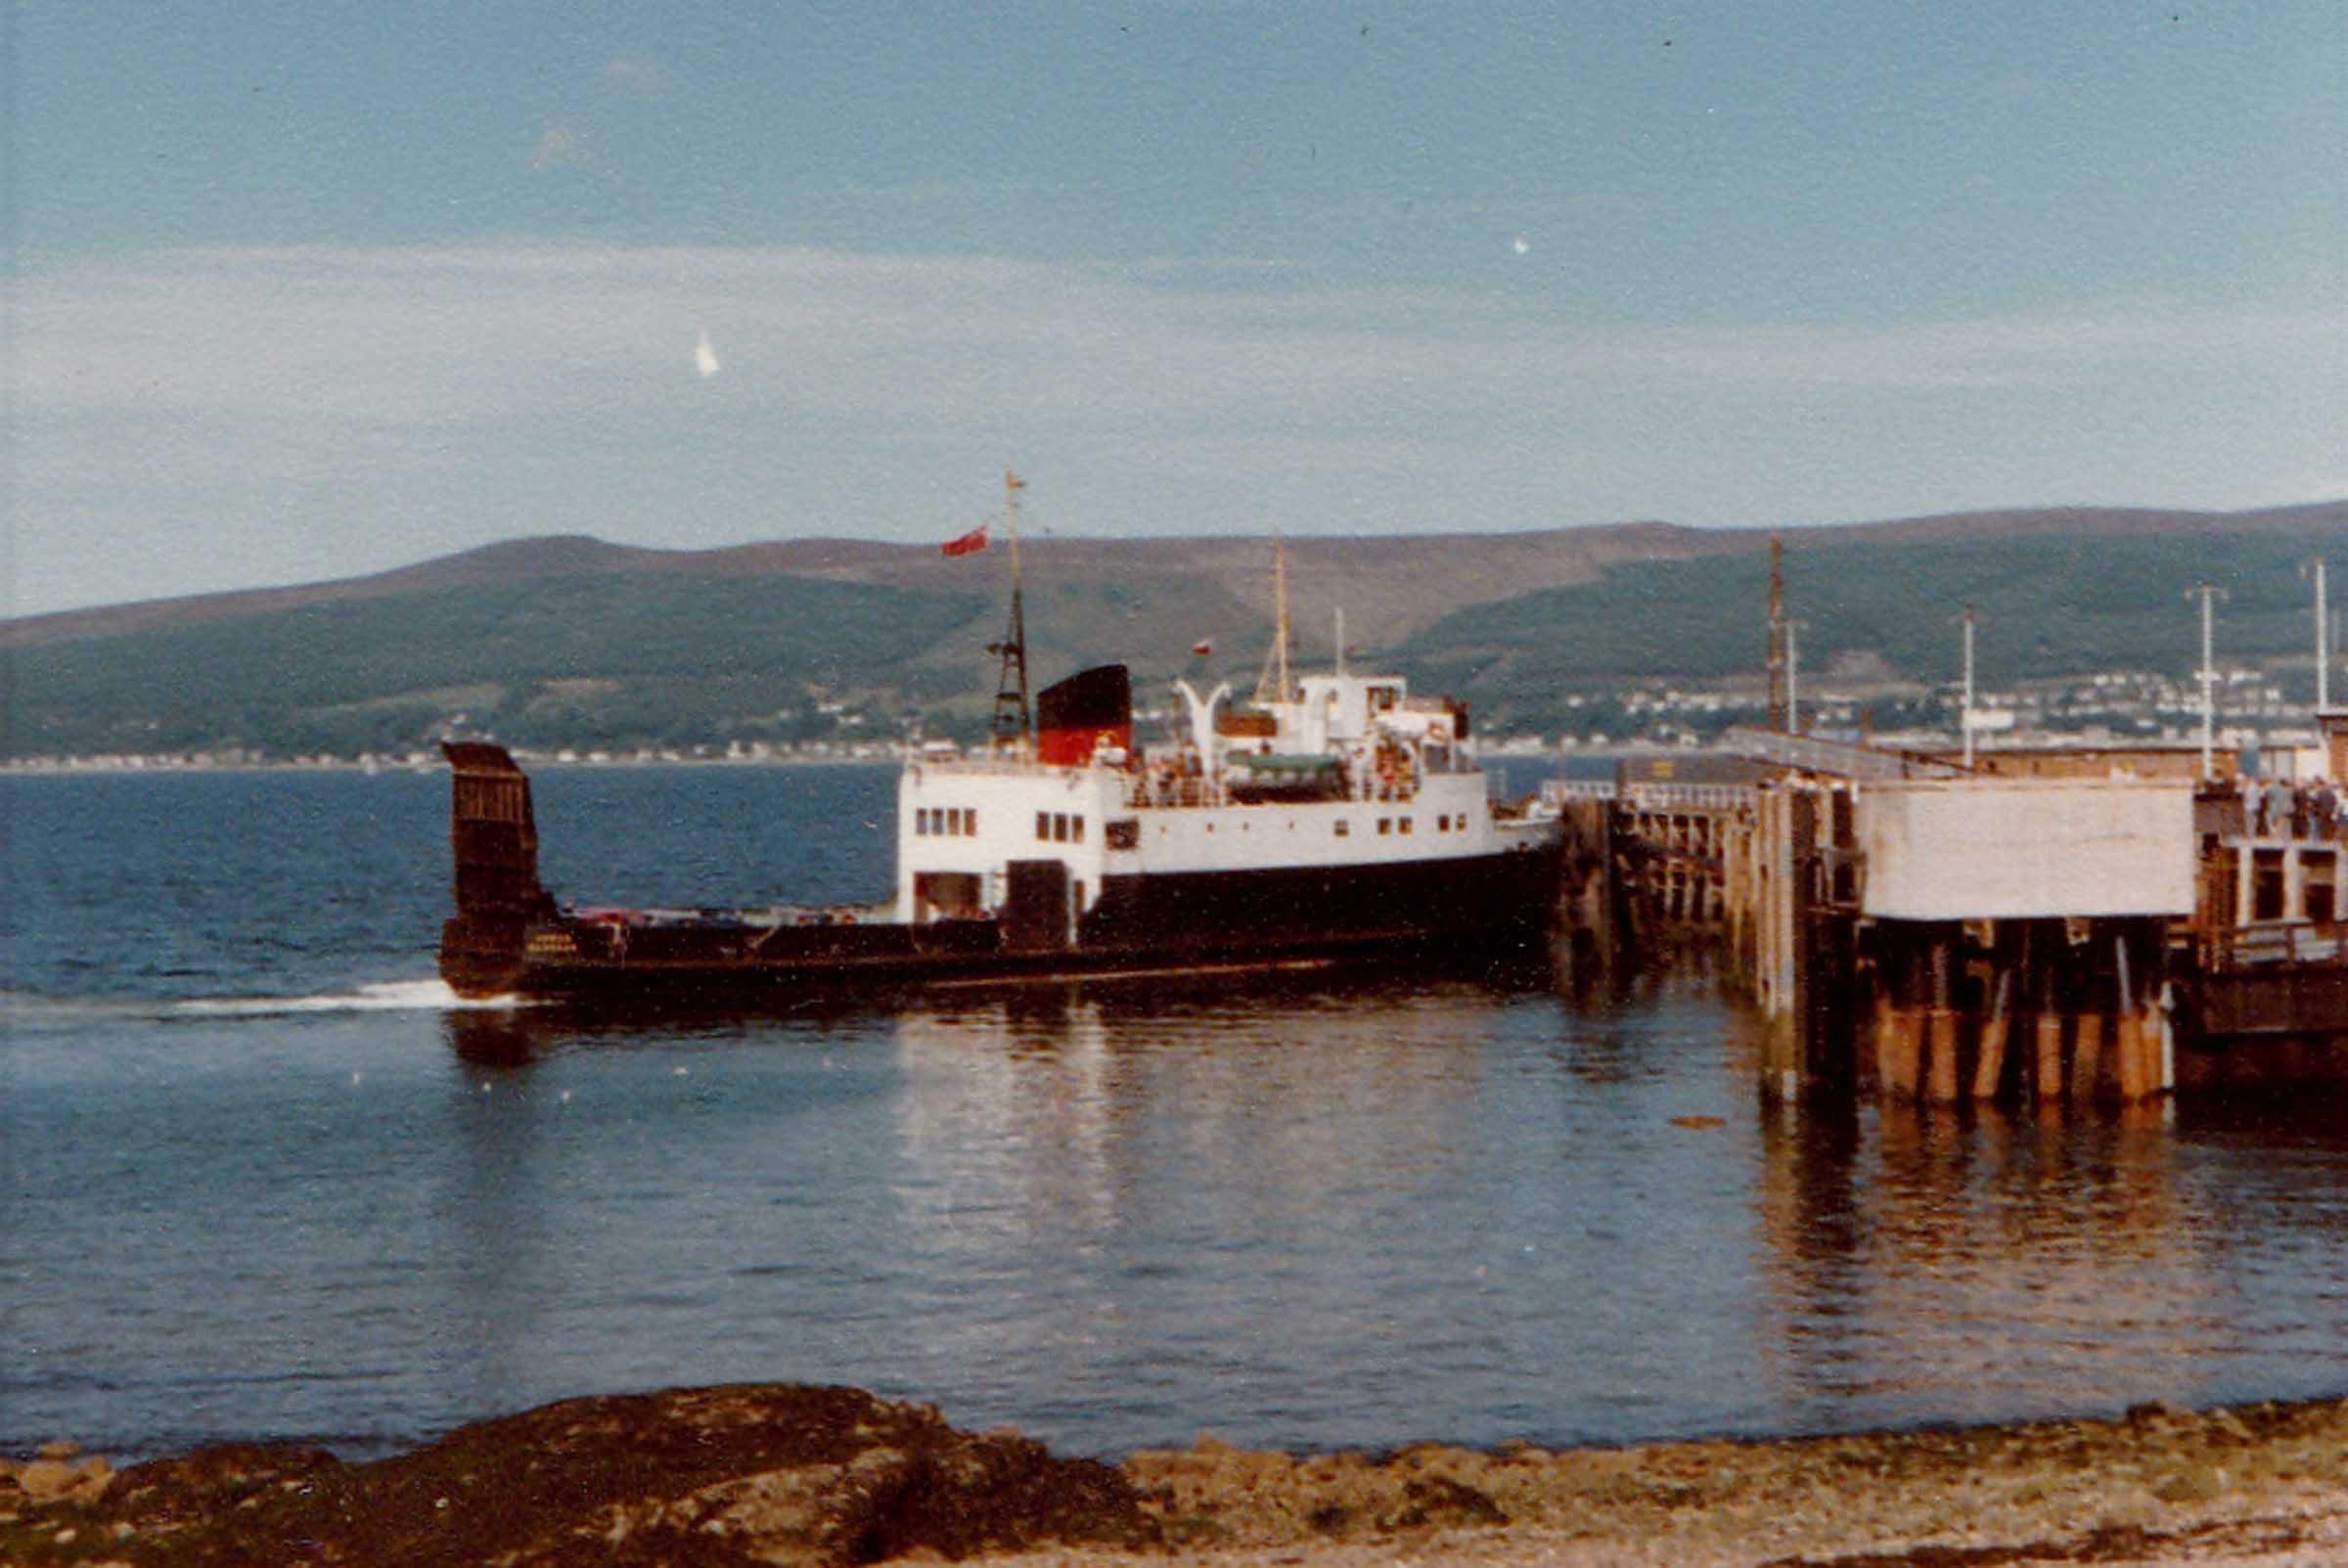 Arran arriving at Wemyss Bay (Jim Aikman Smith)